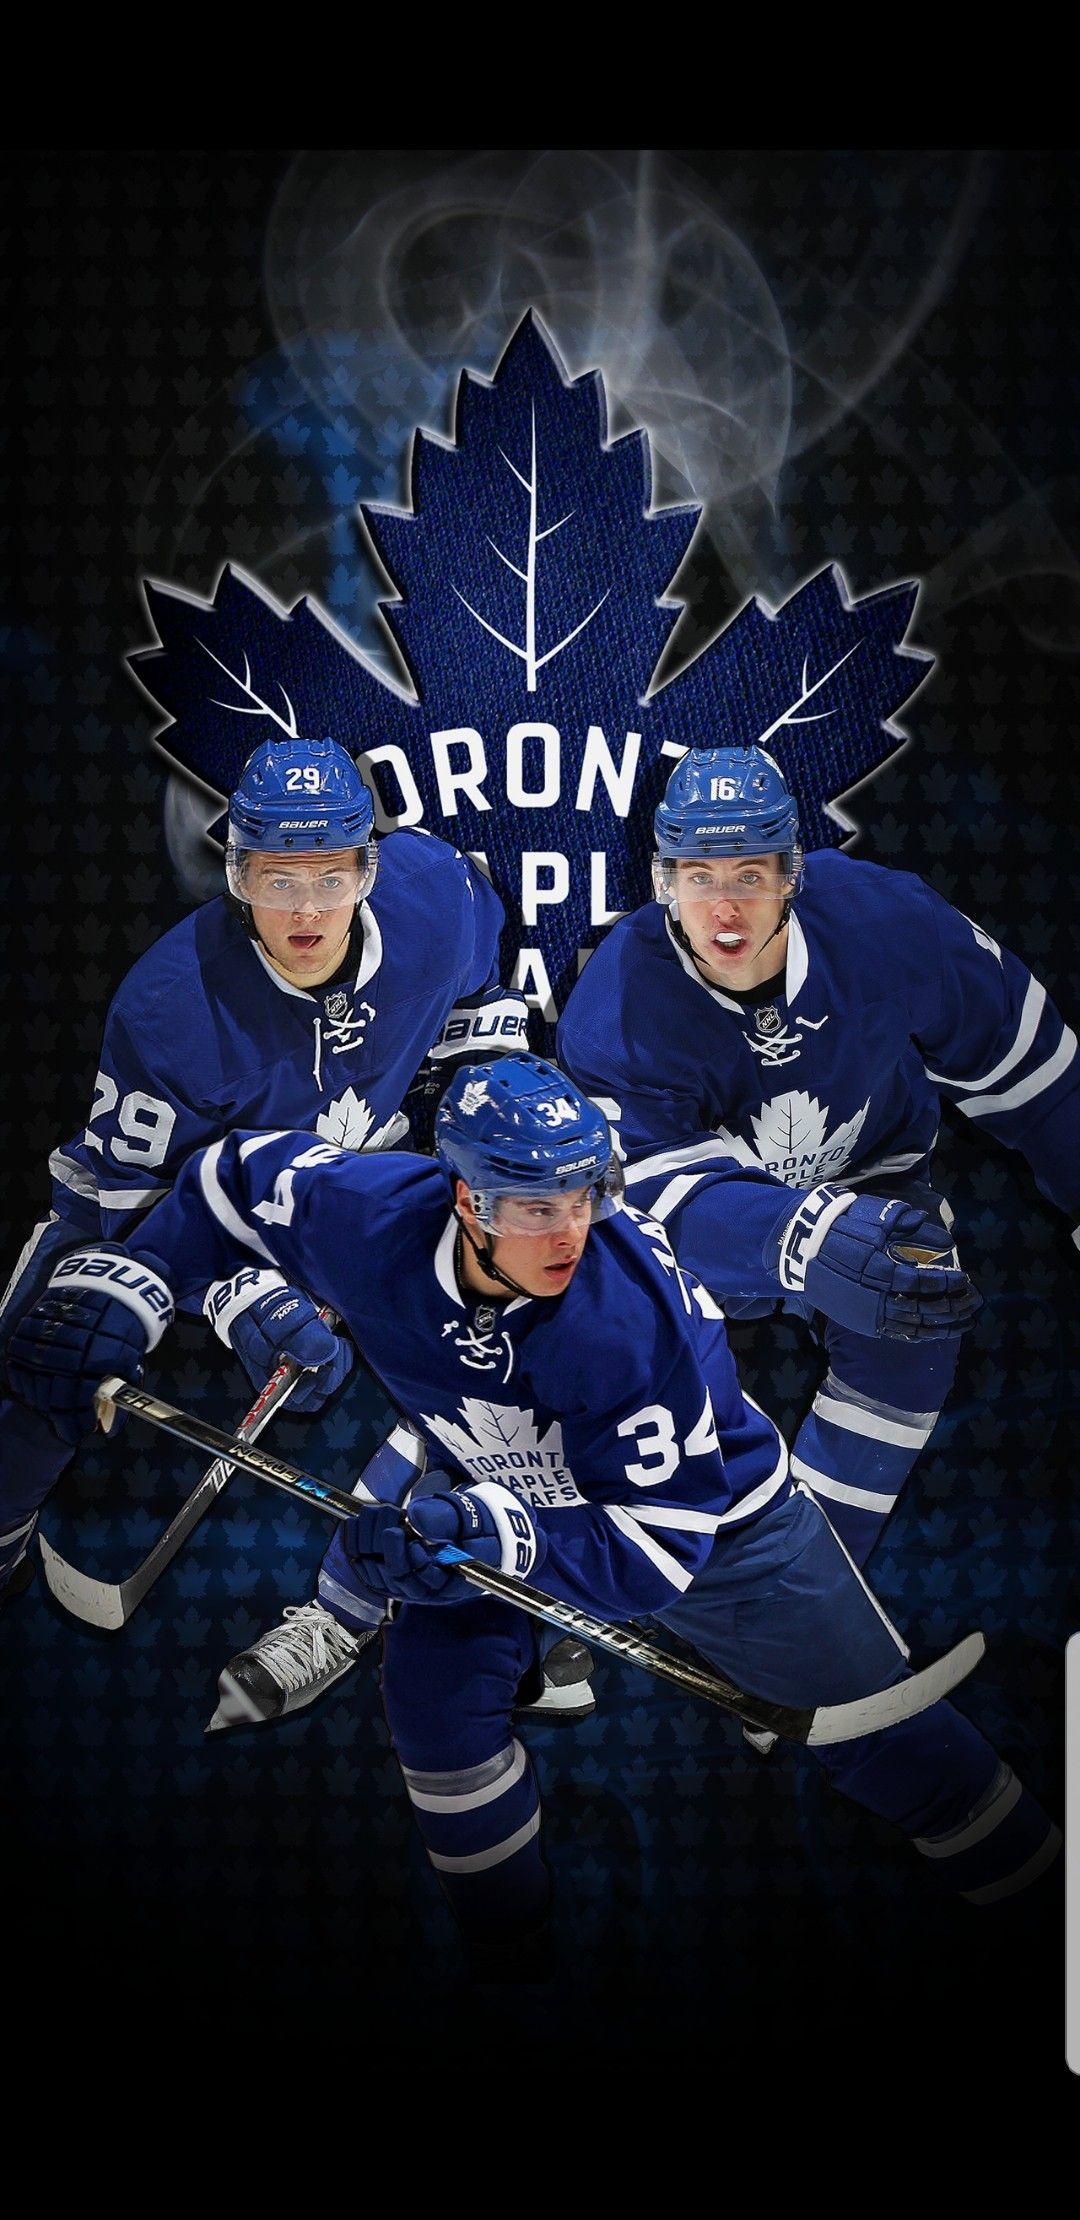 Nylander Marner Matthews Maple Leafs Hockey Toronto Maple Leafs Wallpaper Maple Leafs Wallpaper